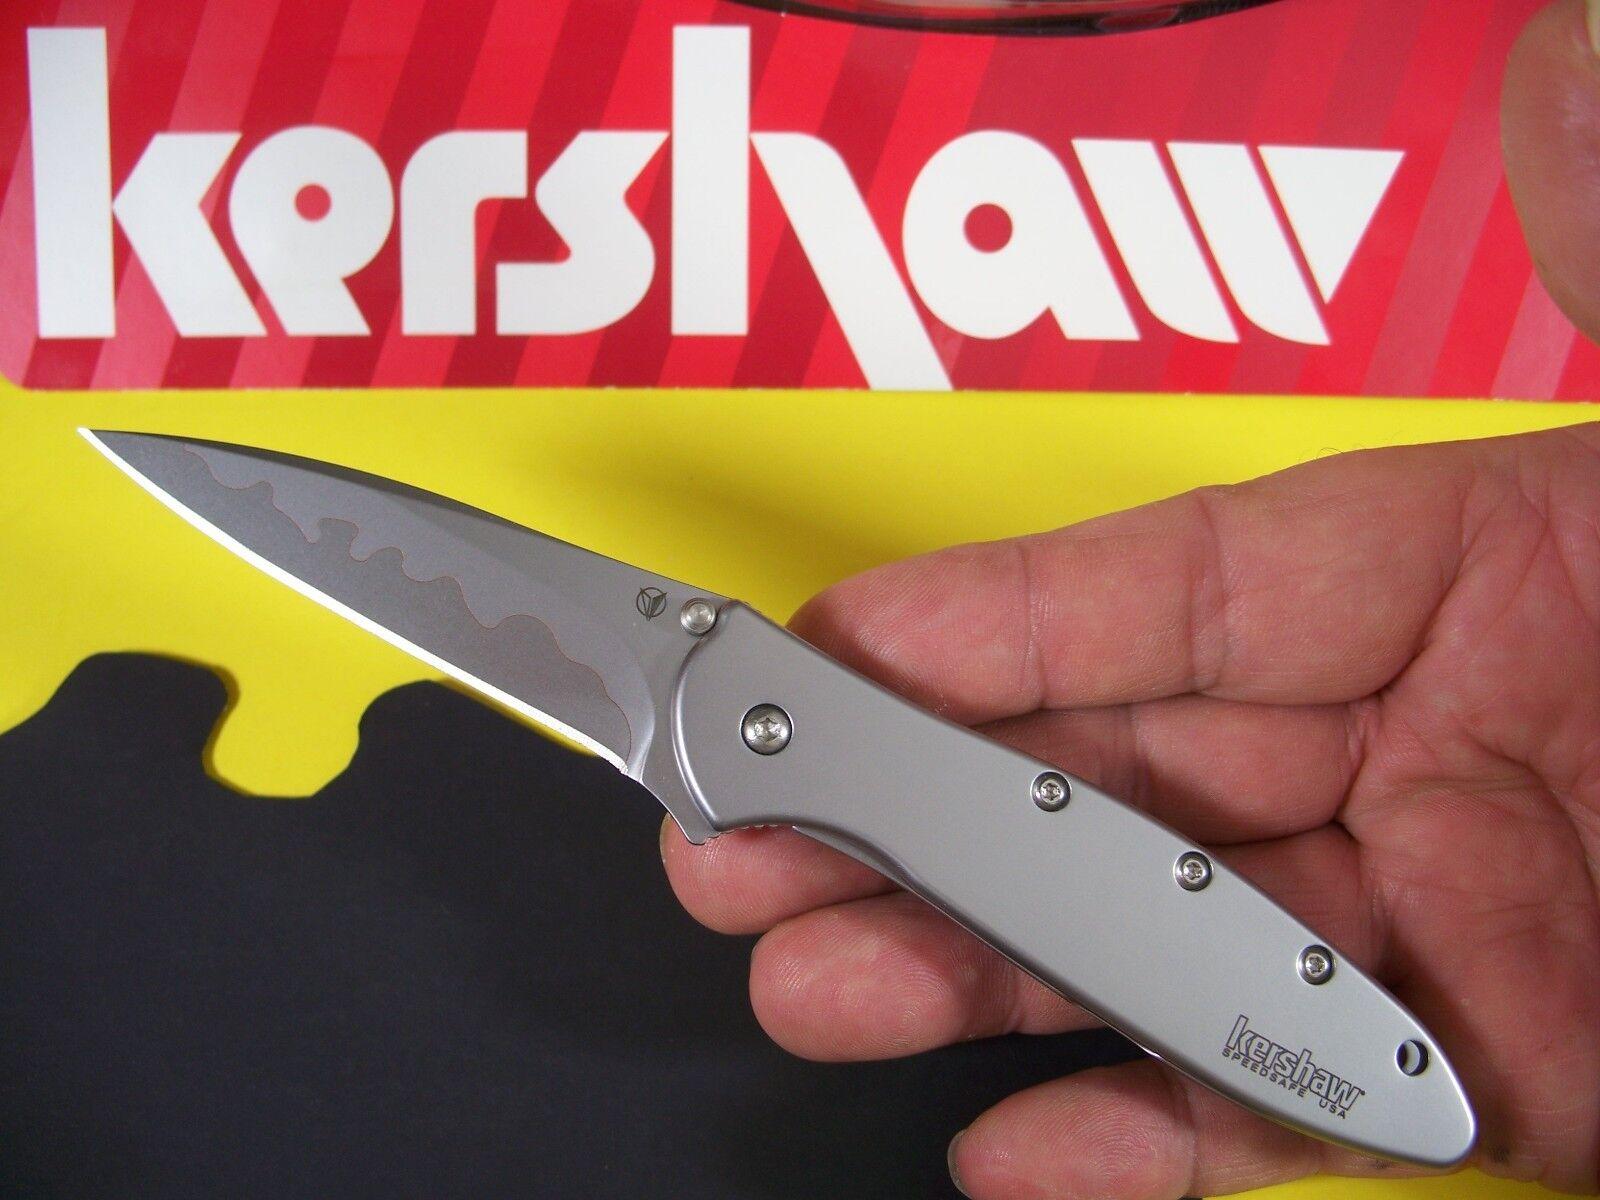 "KERSHAW ""USA"" - Composite Blade LEEK Assisted SPEEDSAFE Knif"